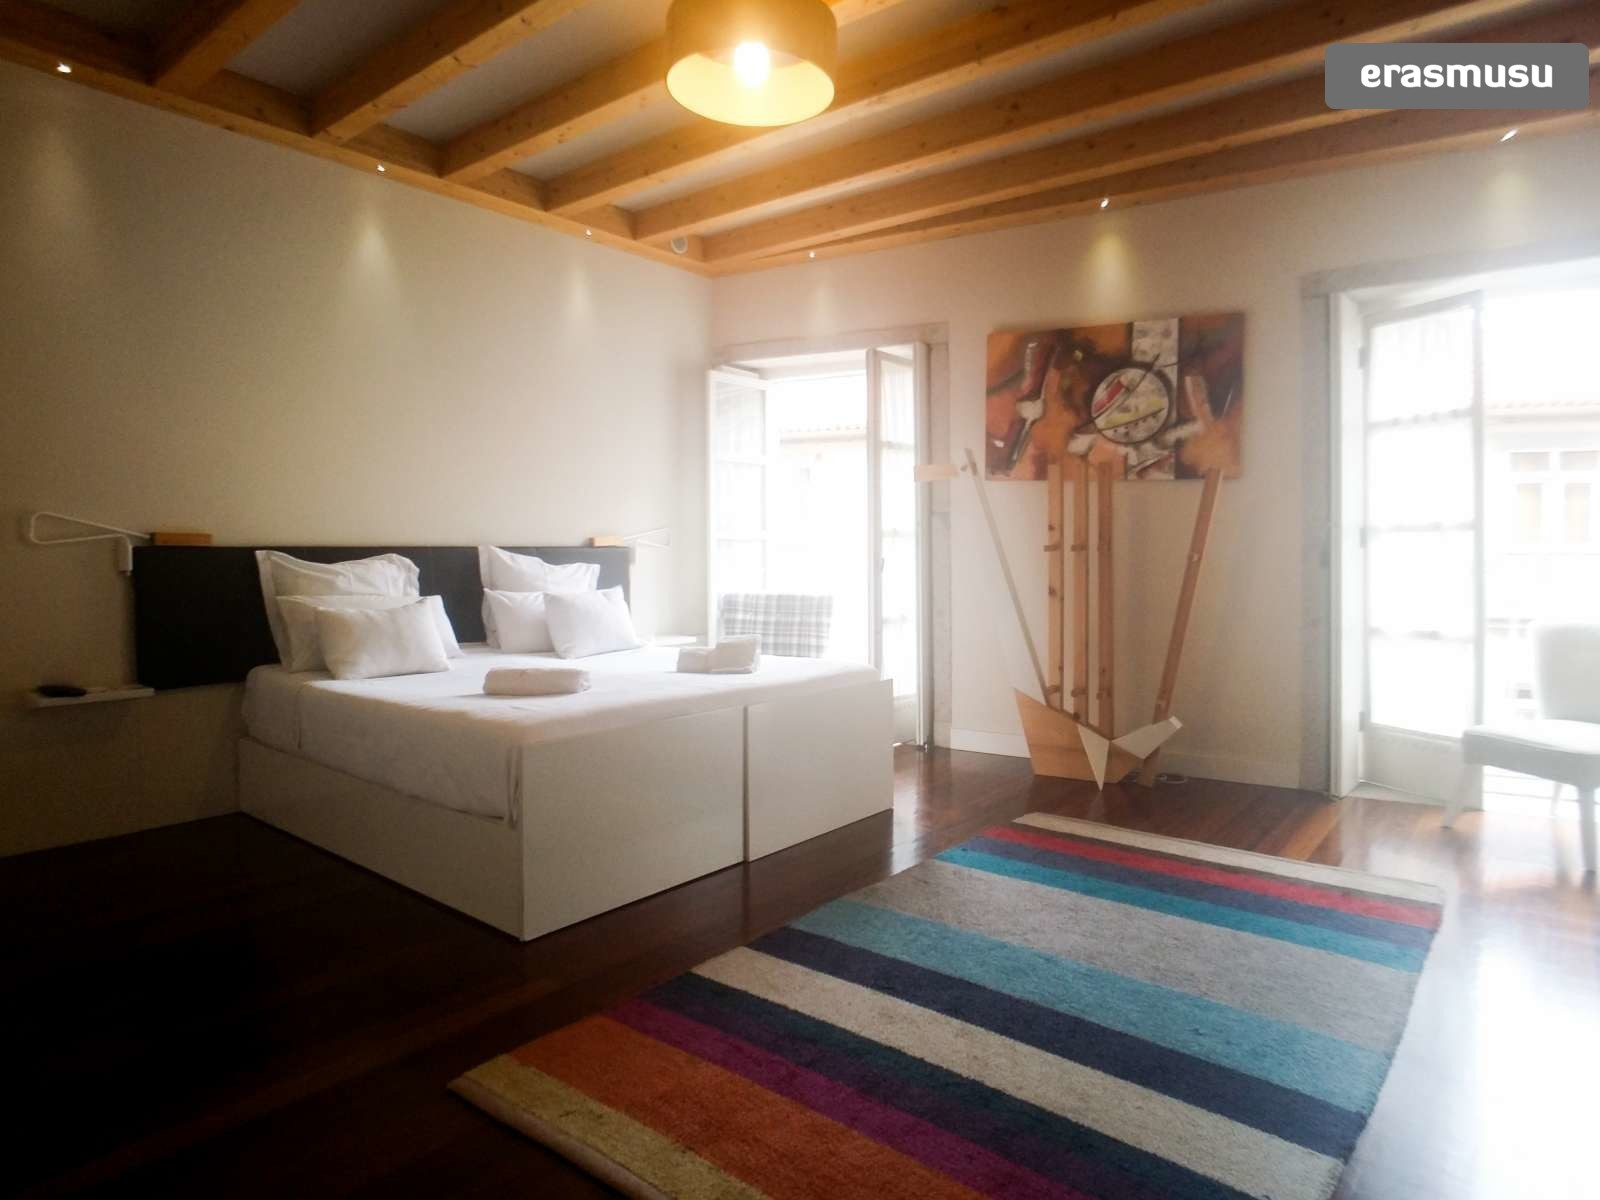 furnished-studio-apartment-rent-sao-nicolau-1d8709c3d98f463bccf0